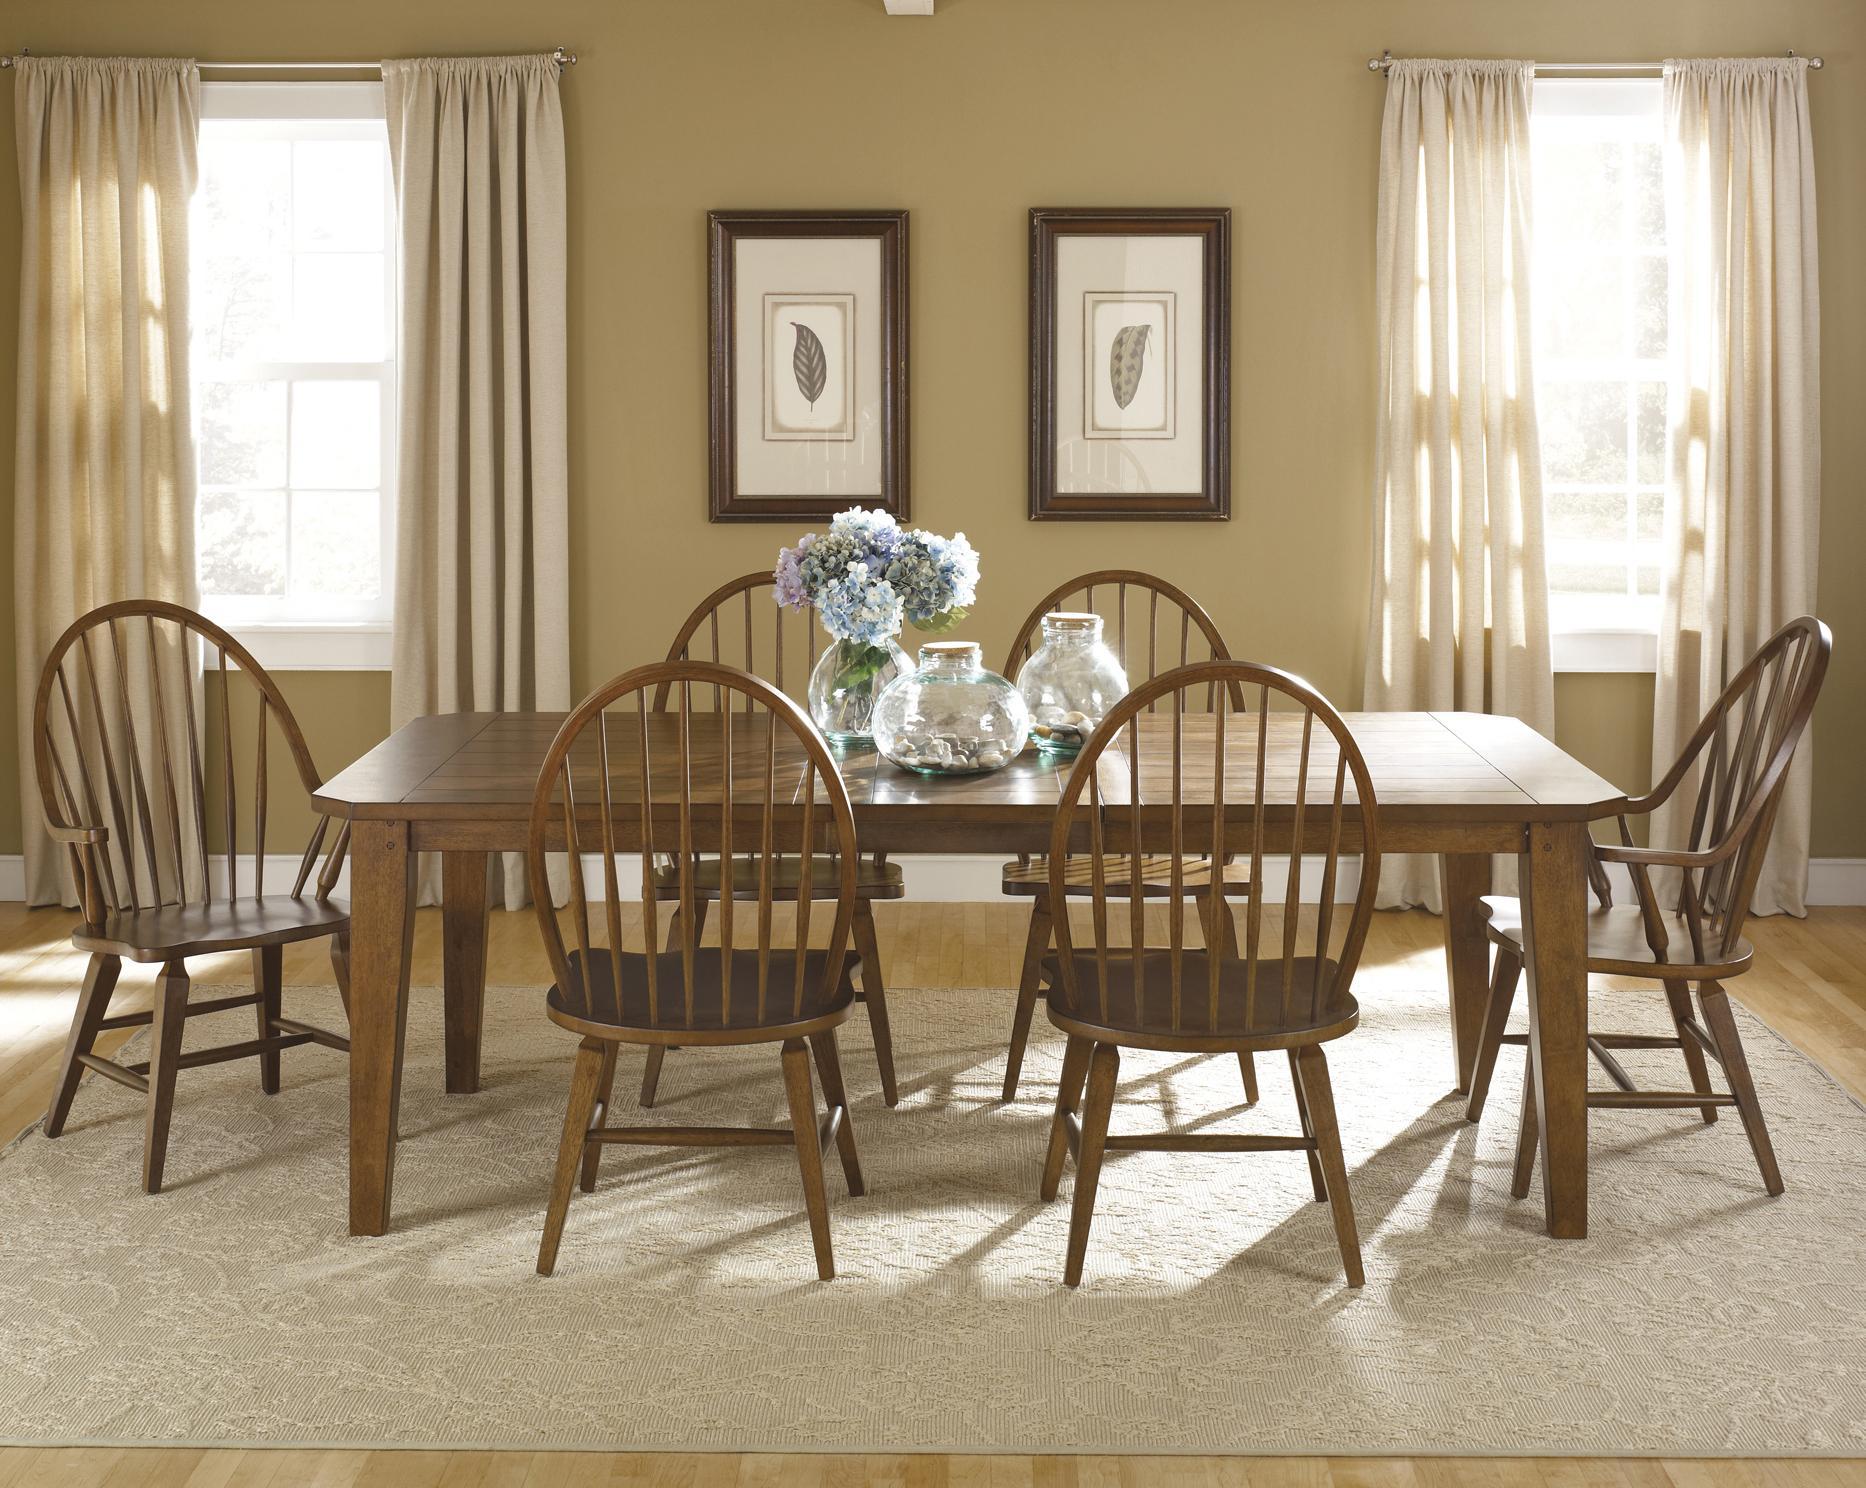 Hearthstone 7-Piece Rectangular Table Set by Liberty Furniture at Lapeer Furniture & Mattress Center